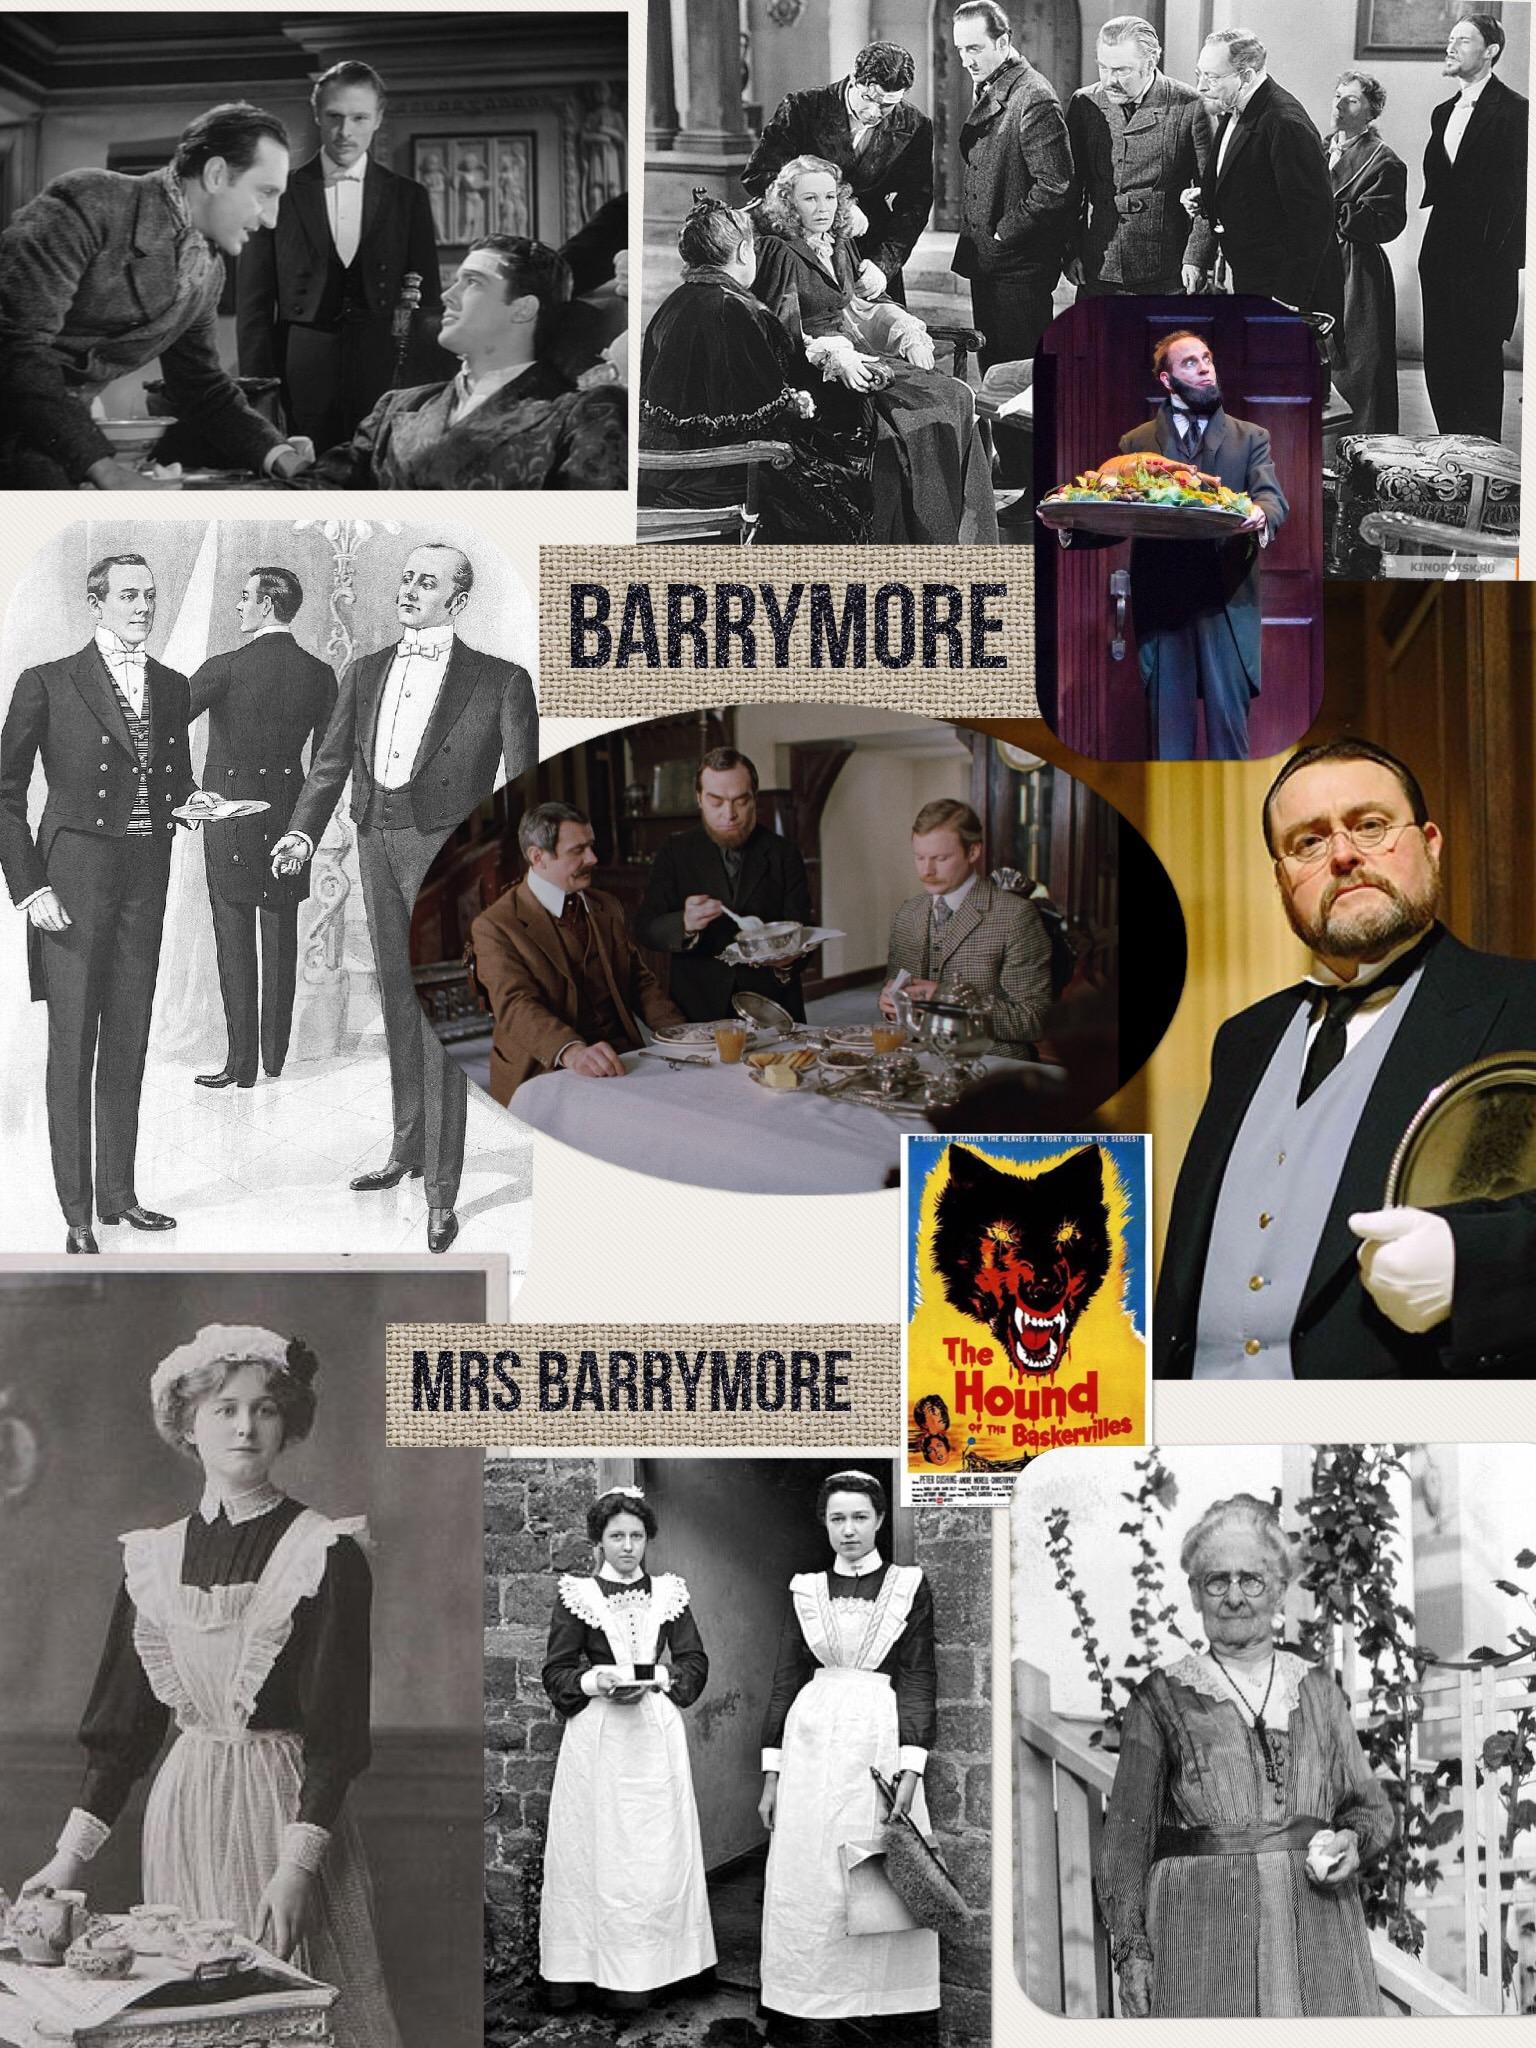 MB Barrymores.jpg